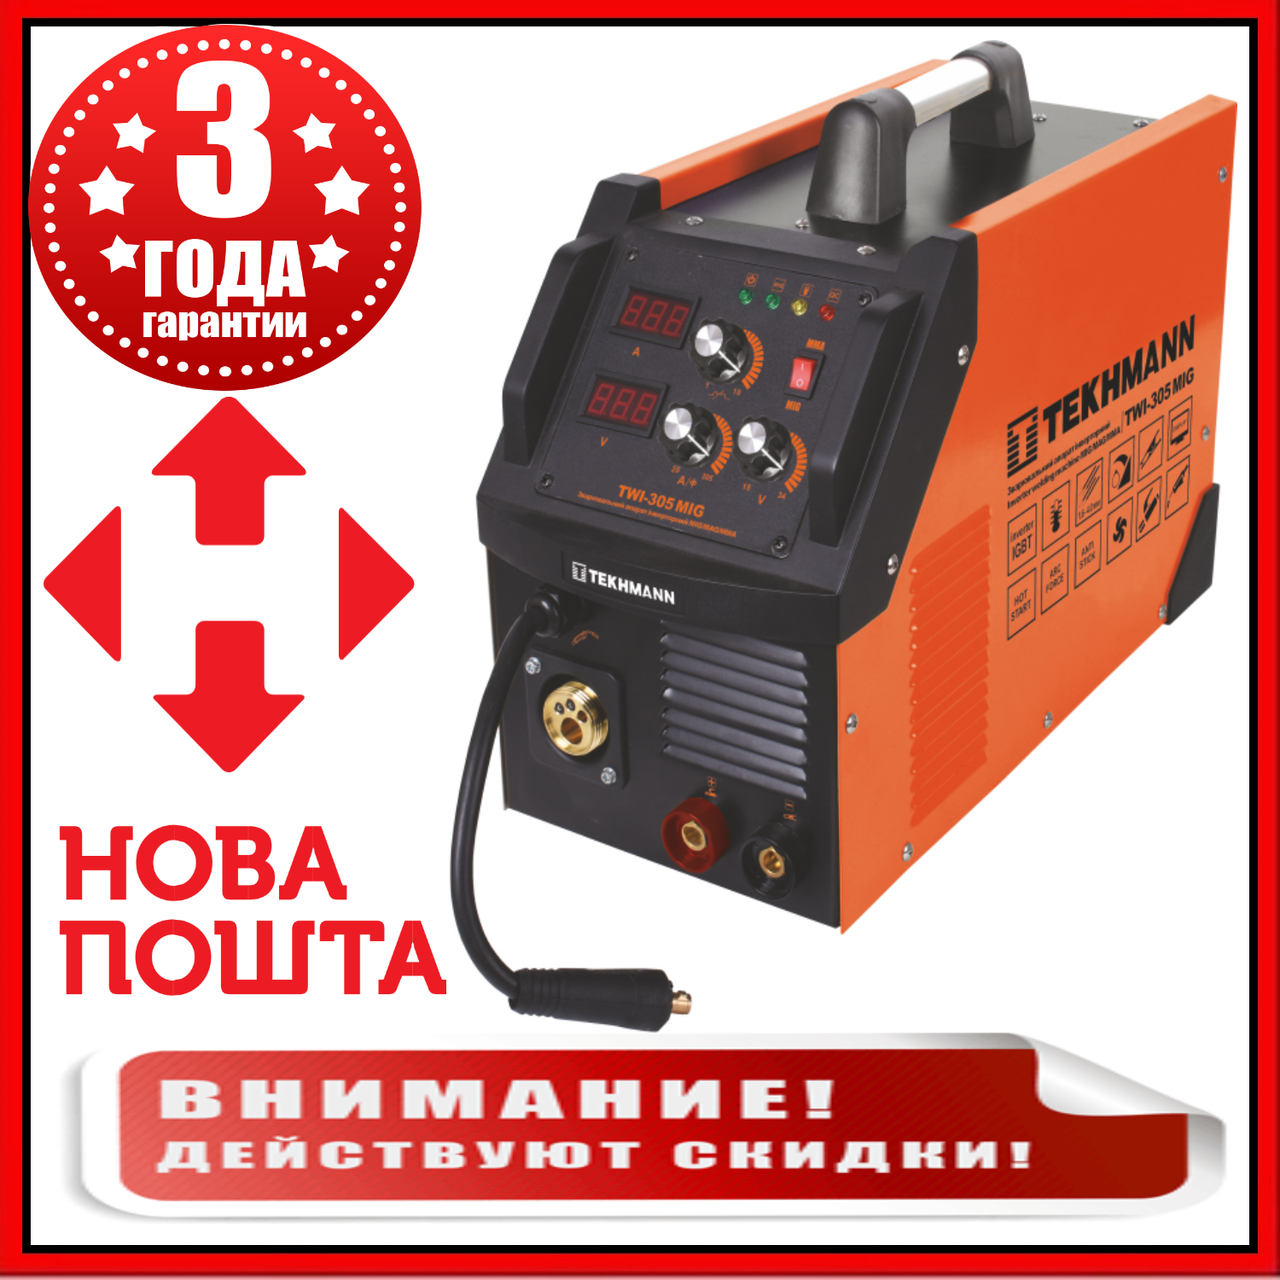 Cварочный полуавтомат Tekhmann TWI-305 MIG